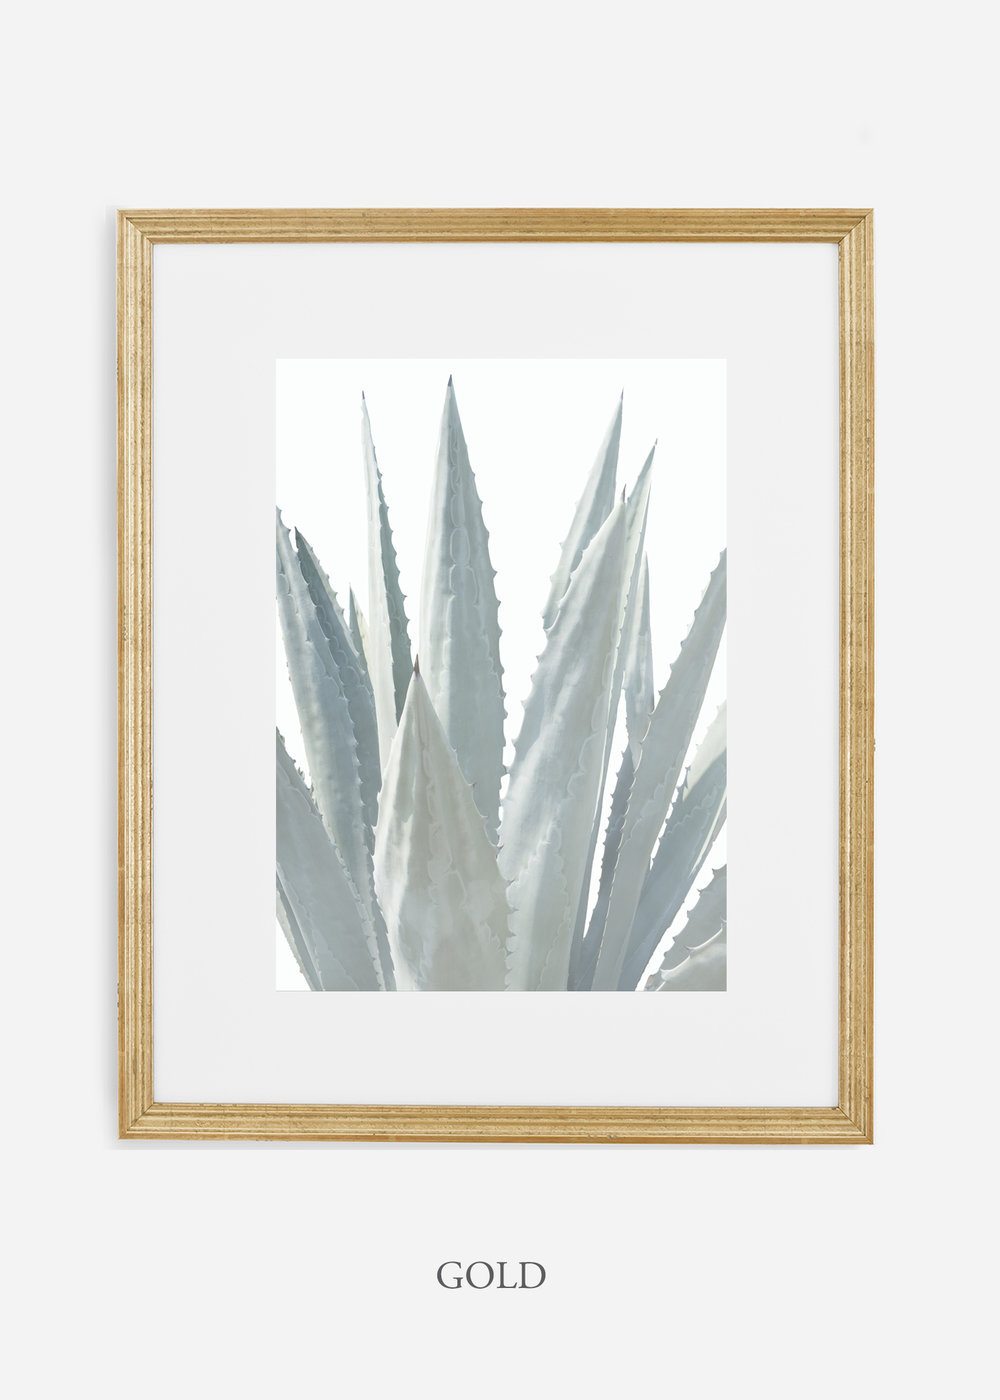 winterwhite_goldframe_WinterWhiteAgaveNo.3_agave_prints_interiordesign_art_homedecor_bohemian_modern_minimal_photography_cactusphotography.jpg